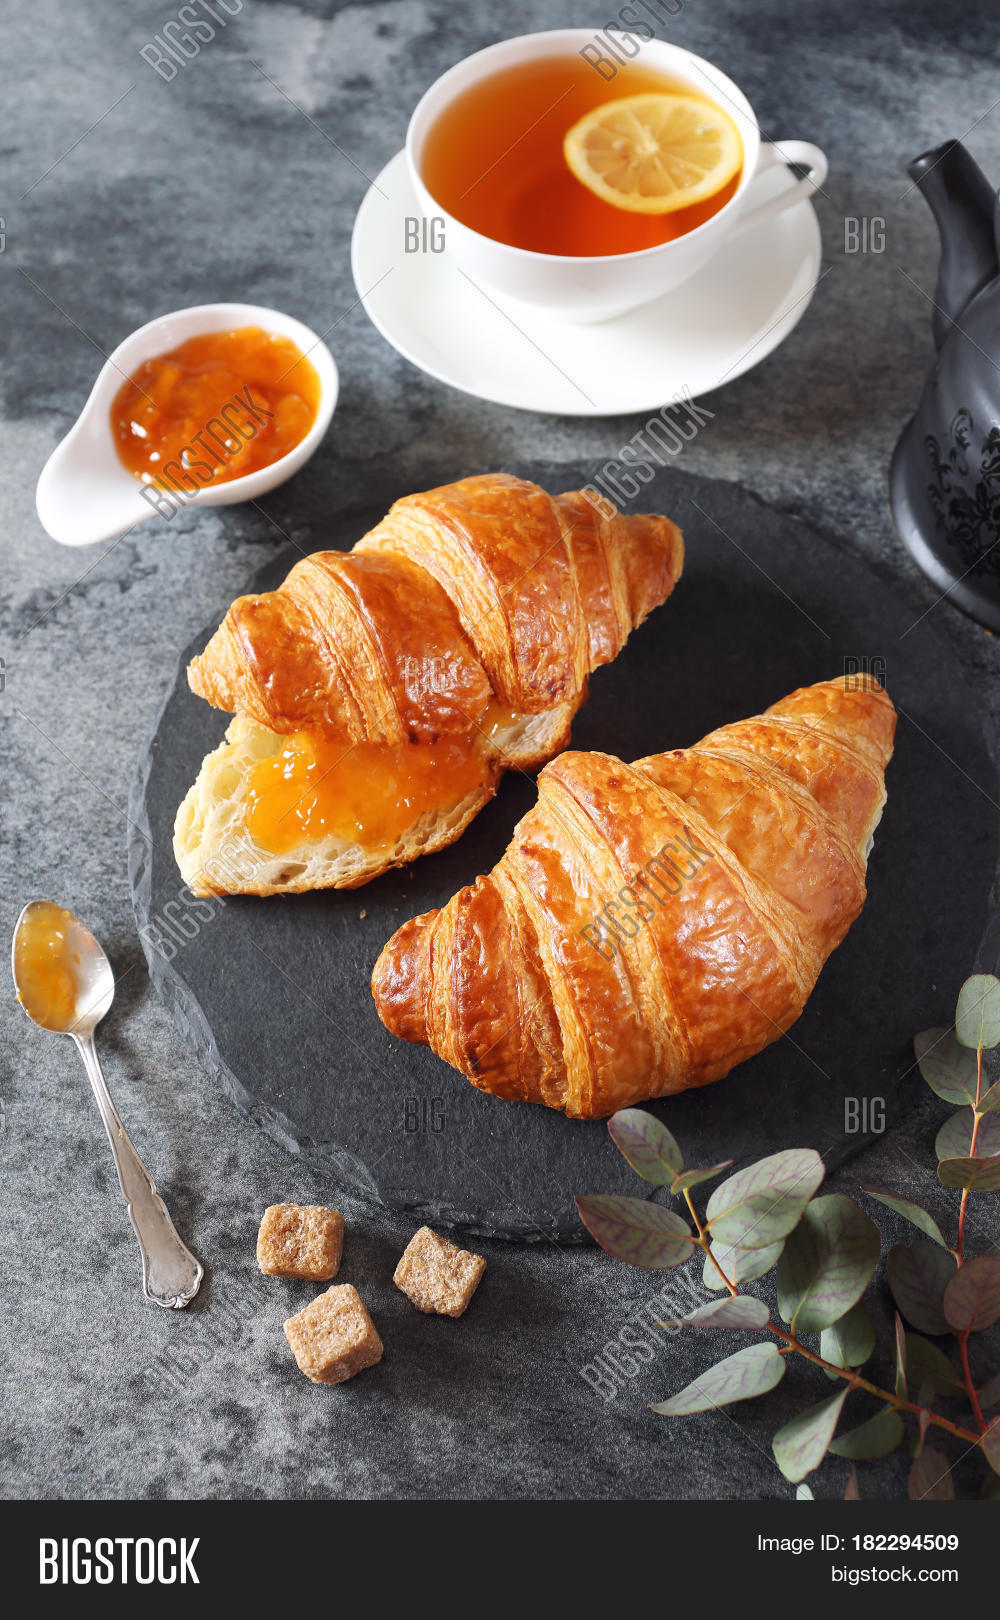 how to make fresh croissants